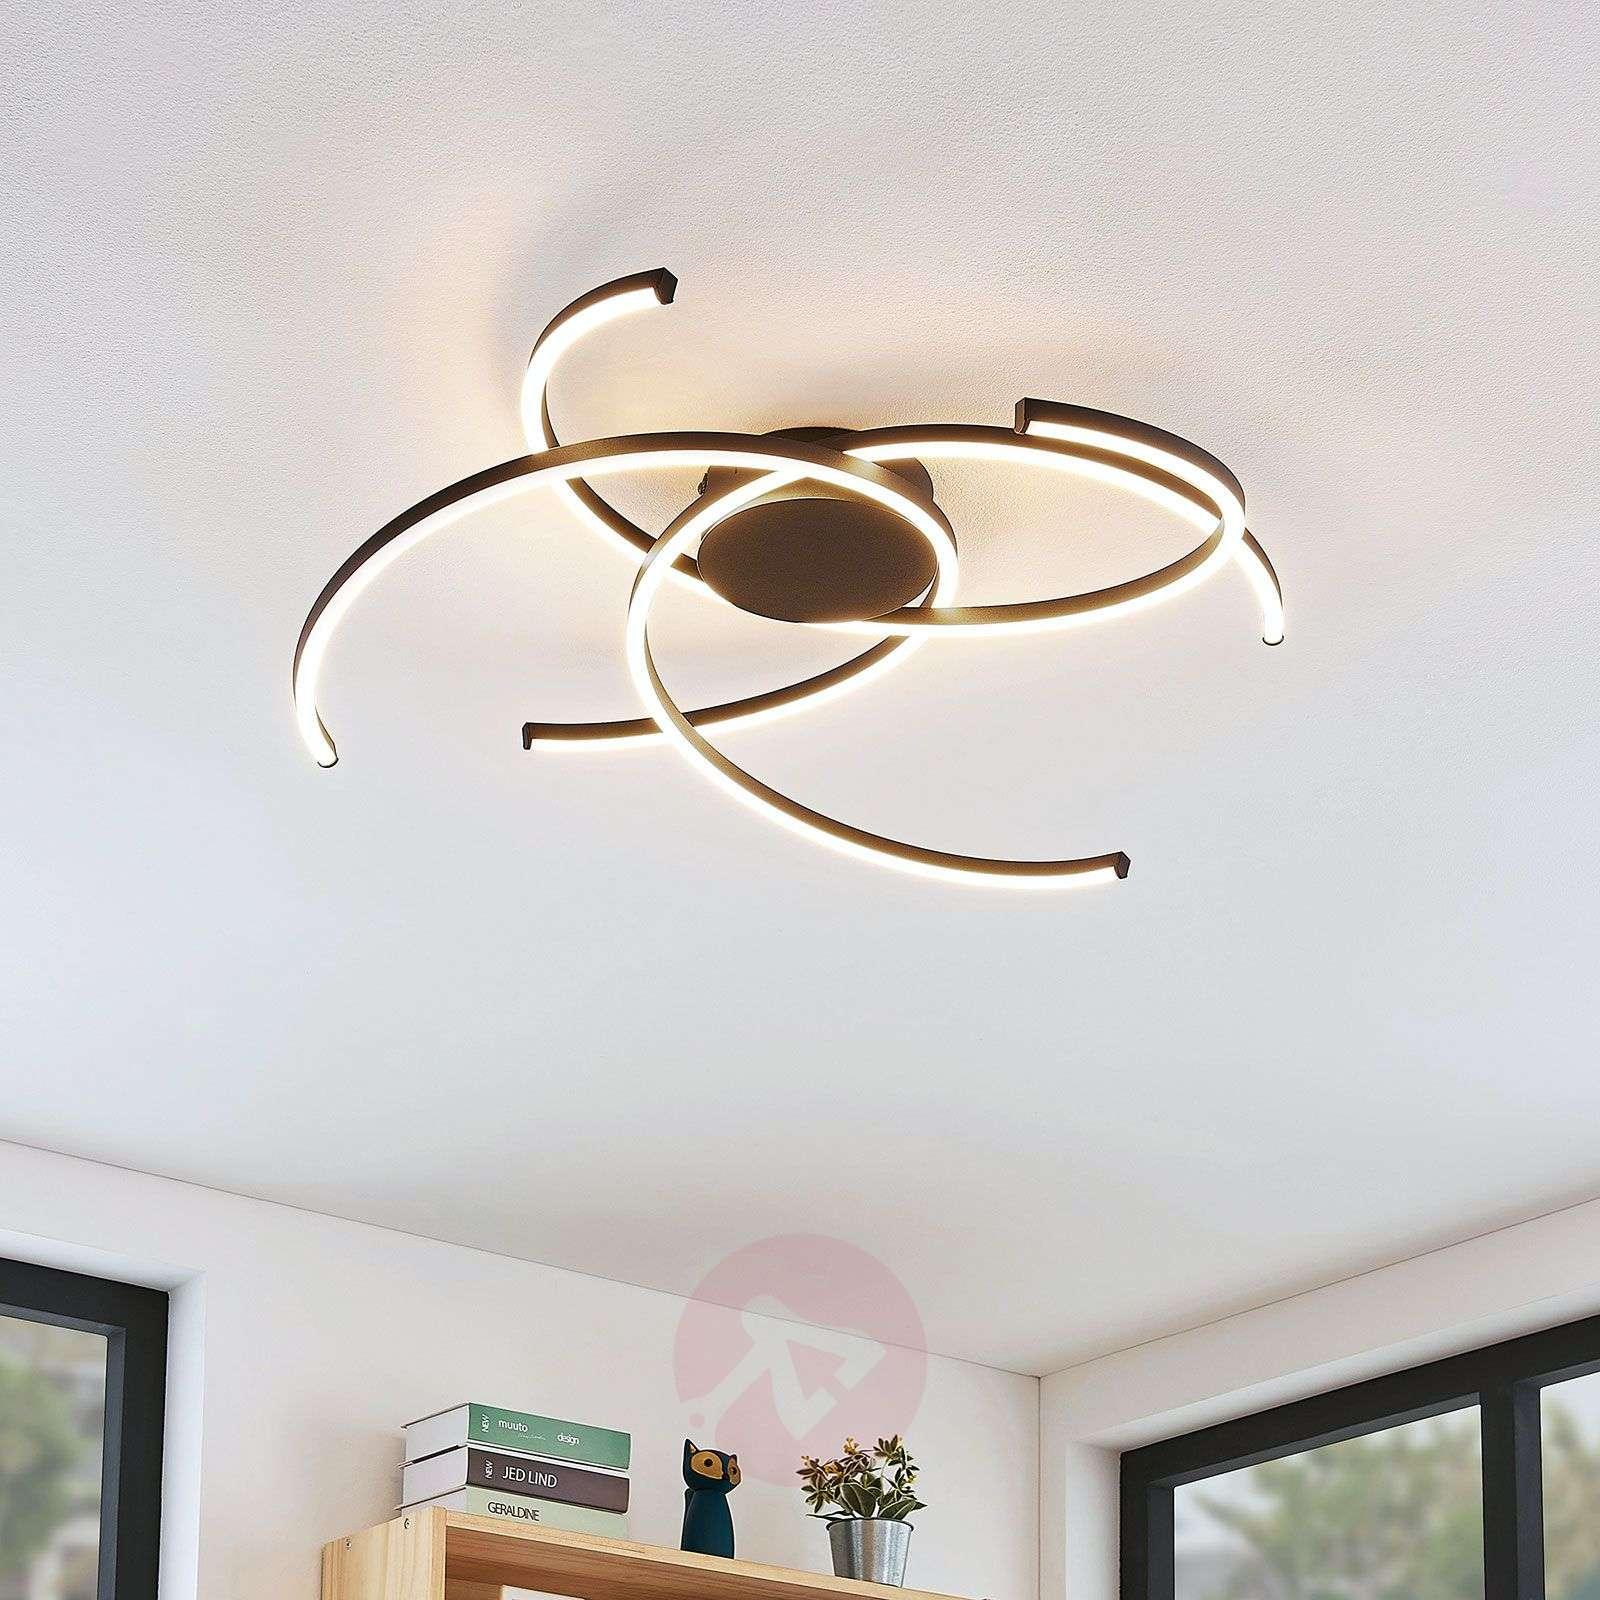 Lindby Katris LED-kattovalaisin, 73 cm, musta-9639155-02